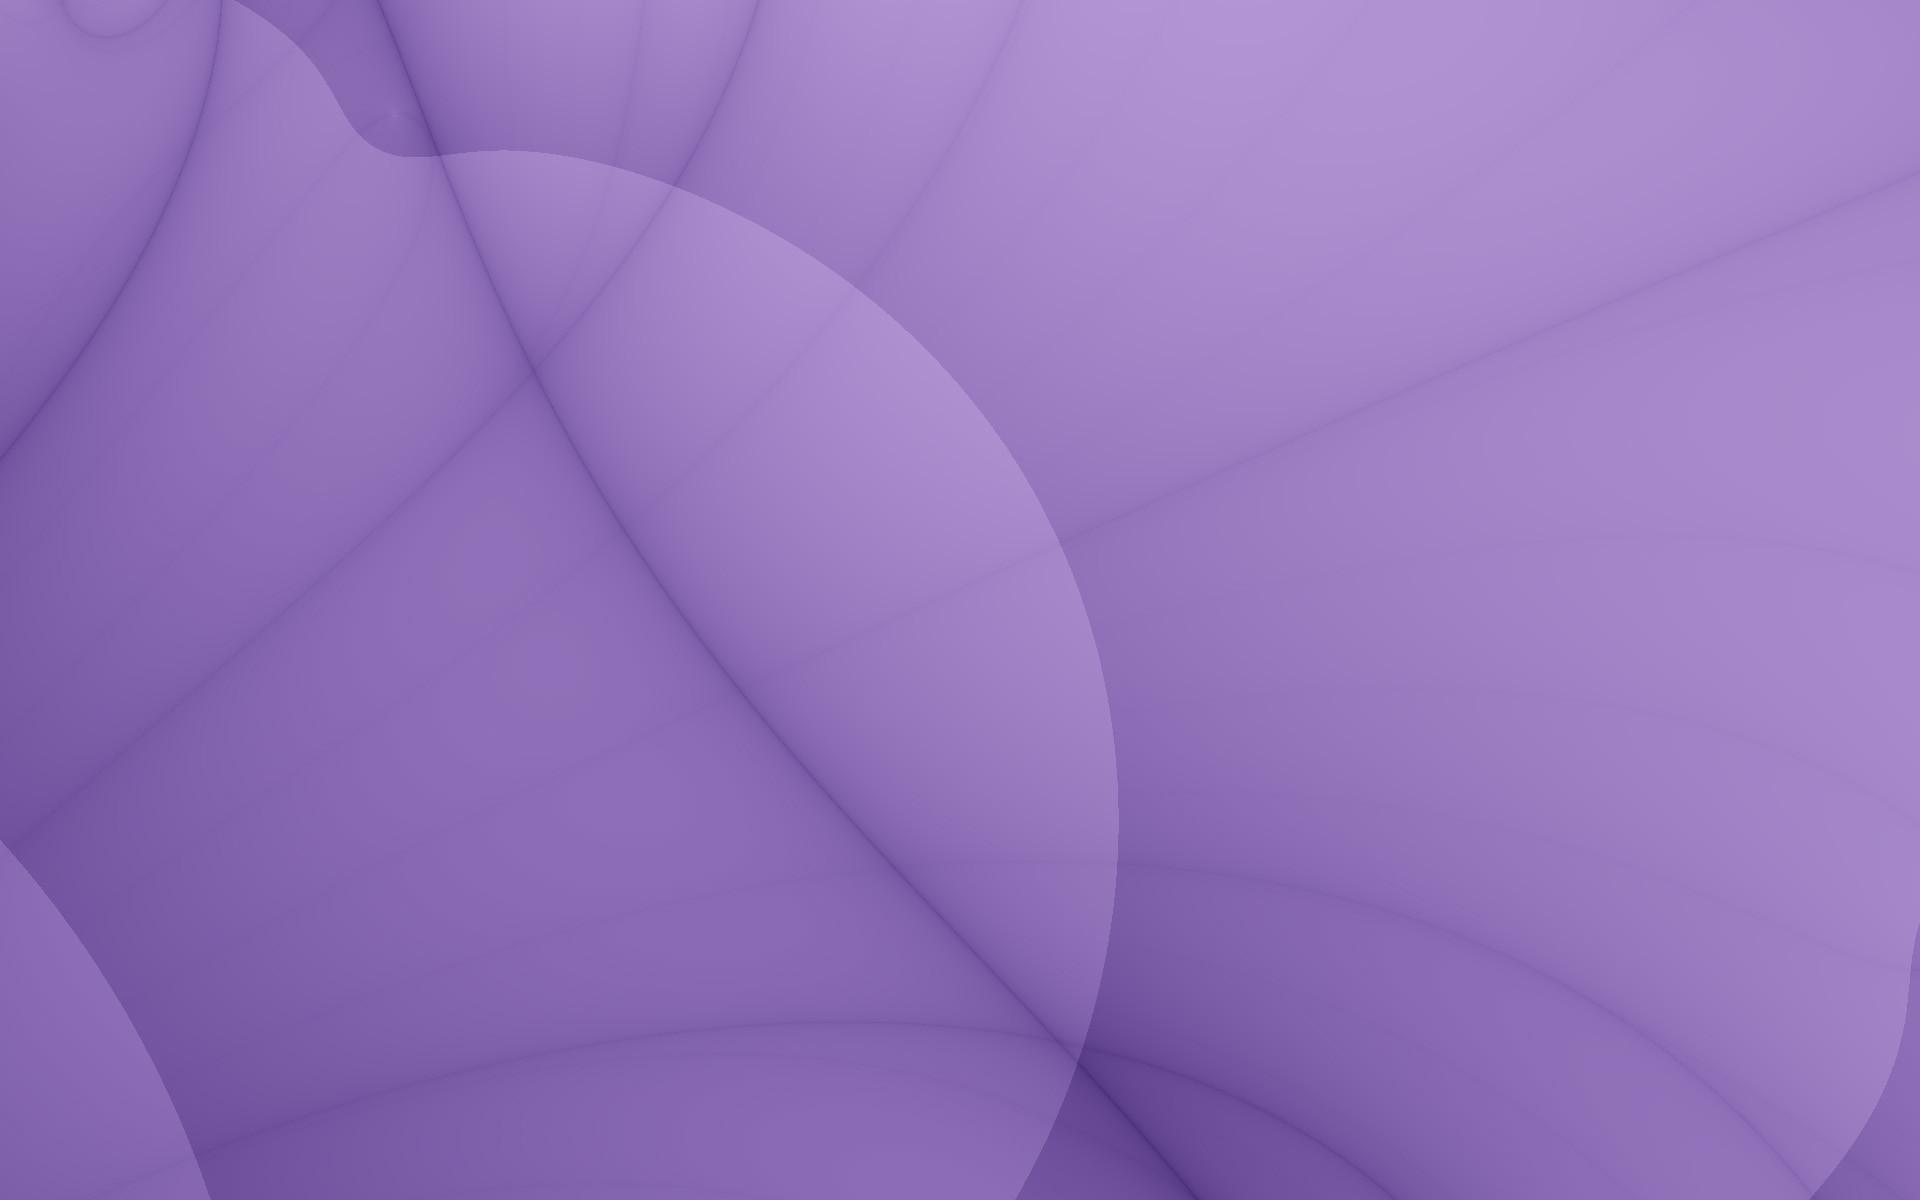 Res: 1920x1200, Bild: Violet Blütenblatt wallpapers and stock photos. «